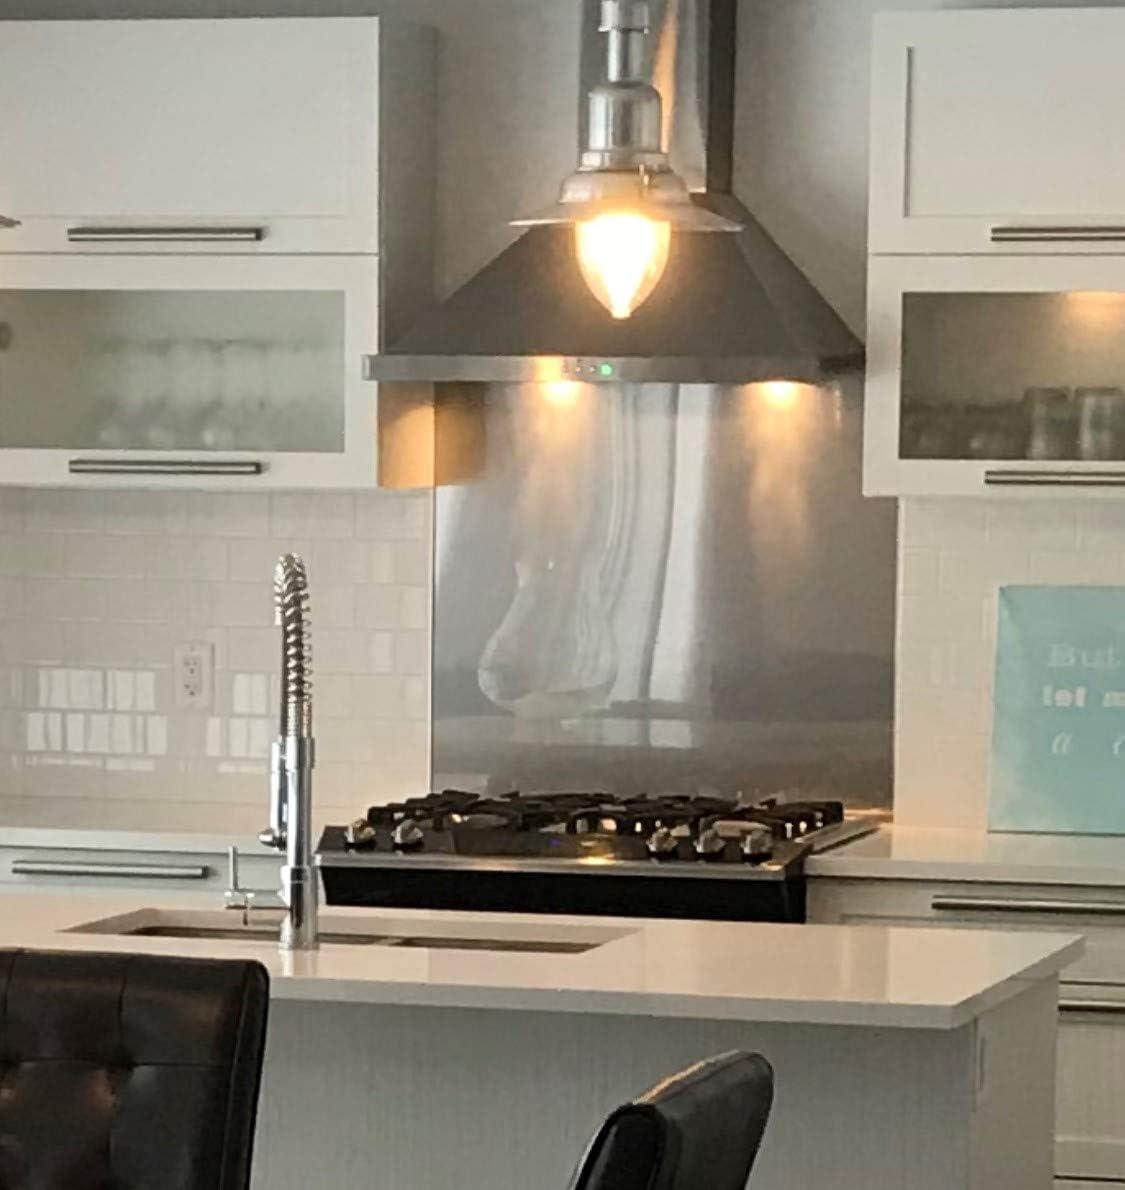 Sb Inox Stainless Steel Kitchen Backsplash 24 X 30 18ga 4 Ss304 Amazon Ca Home Kitchen